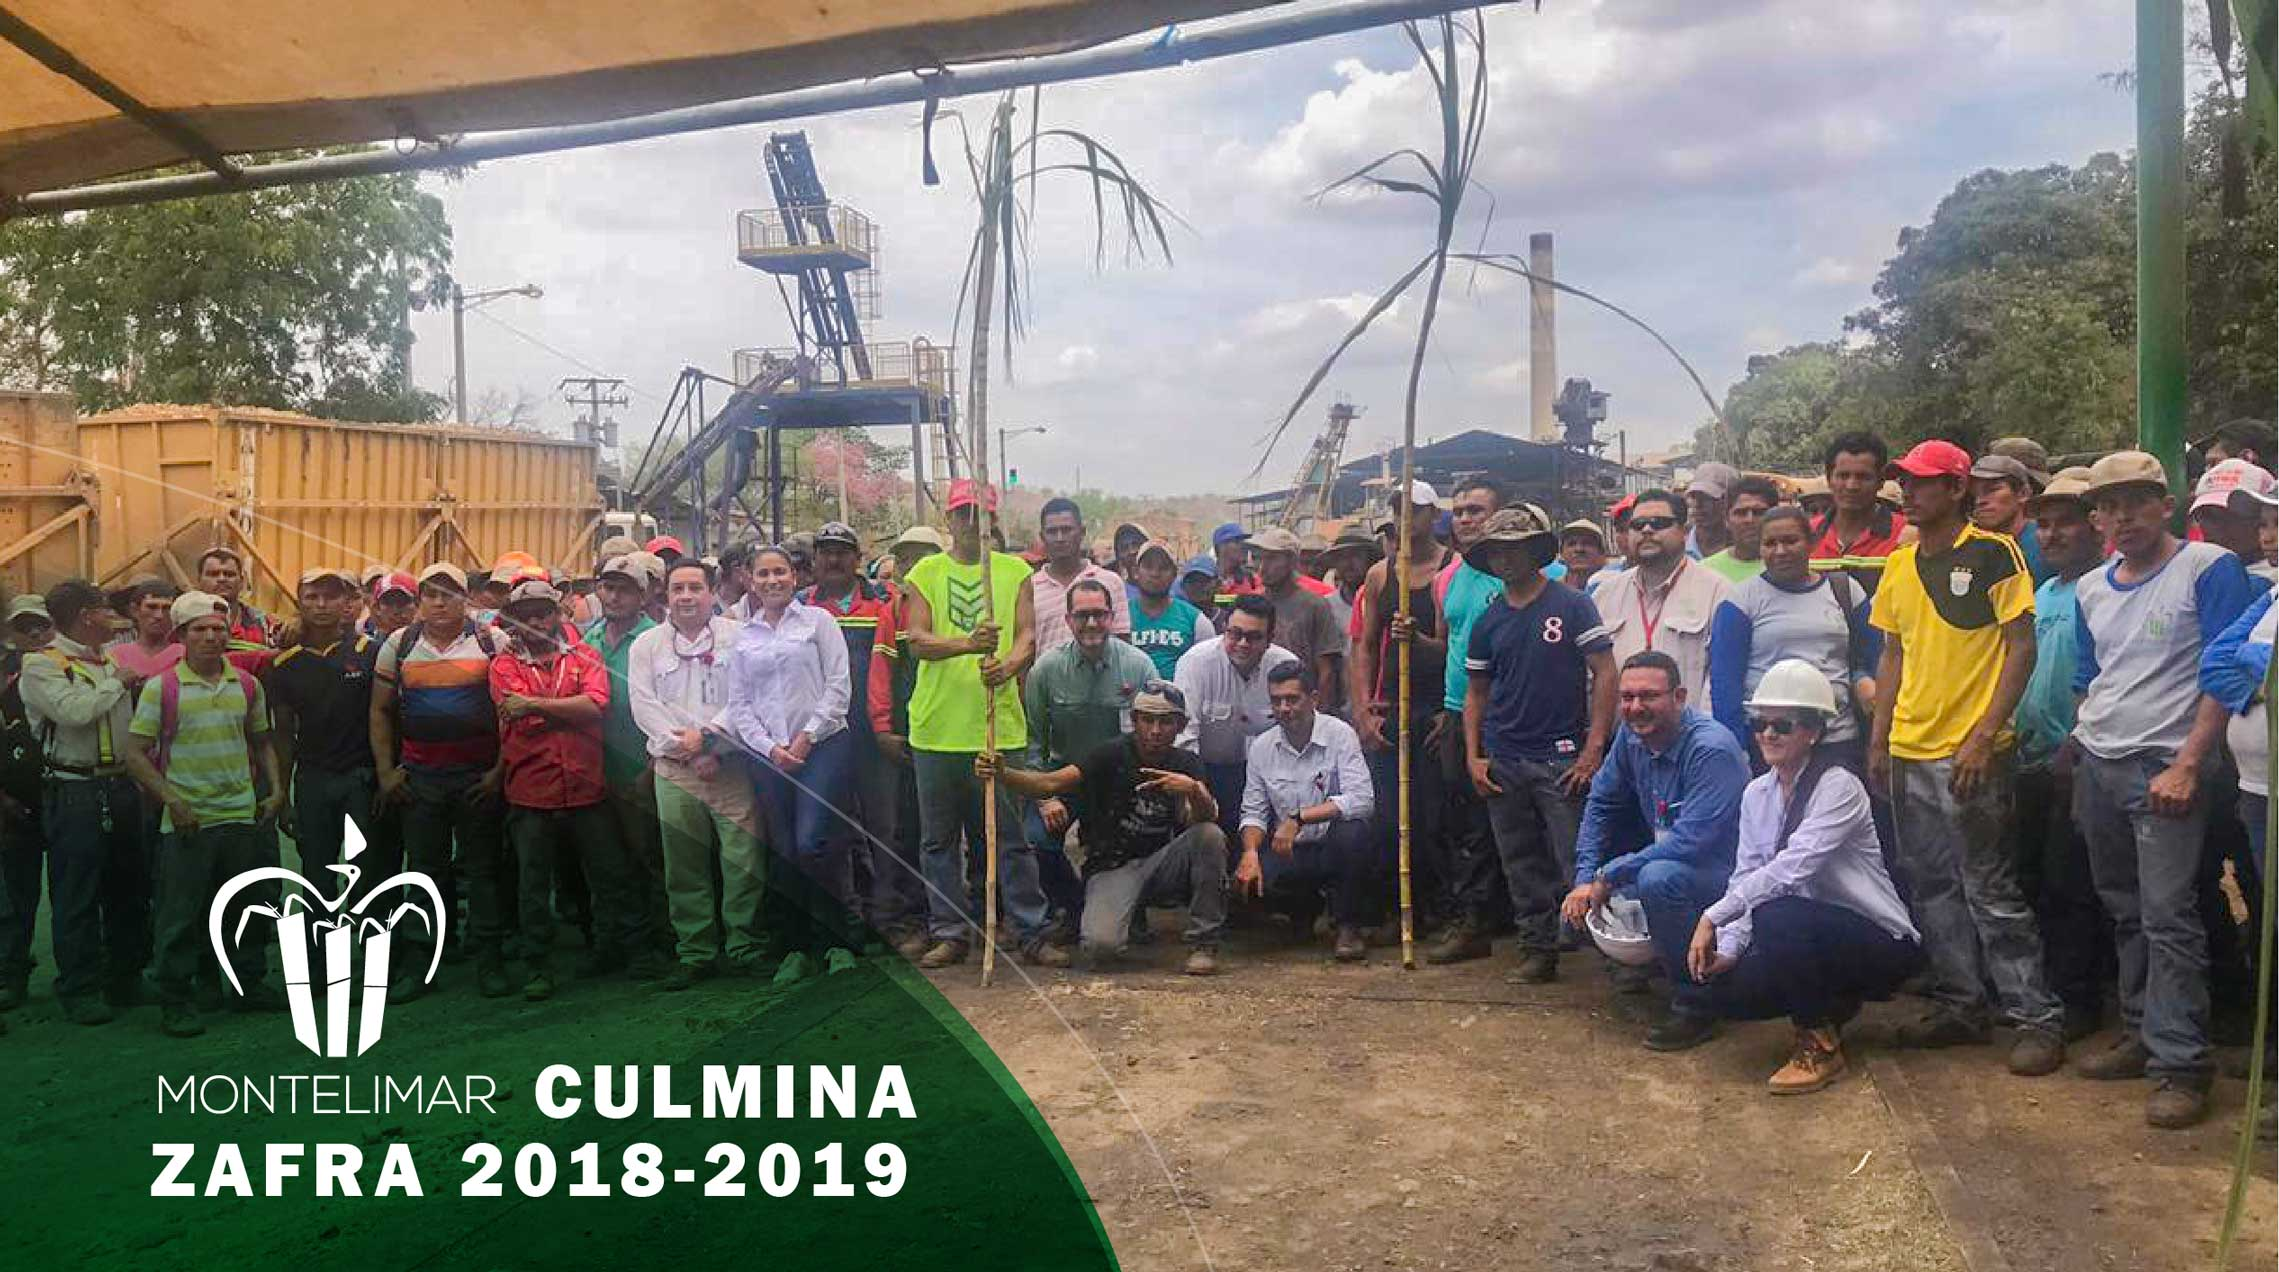 Montelimar culmina Zafra 2018 – 2019